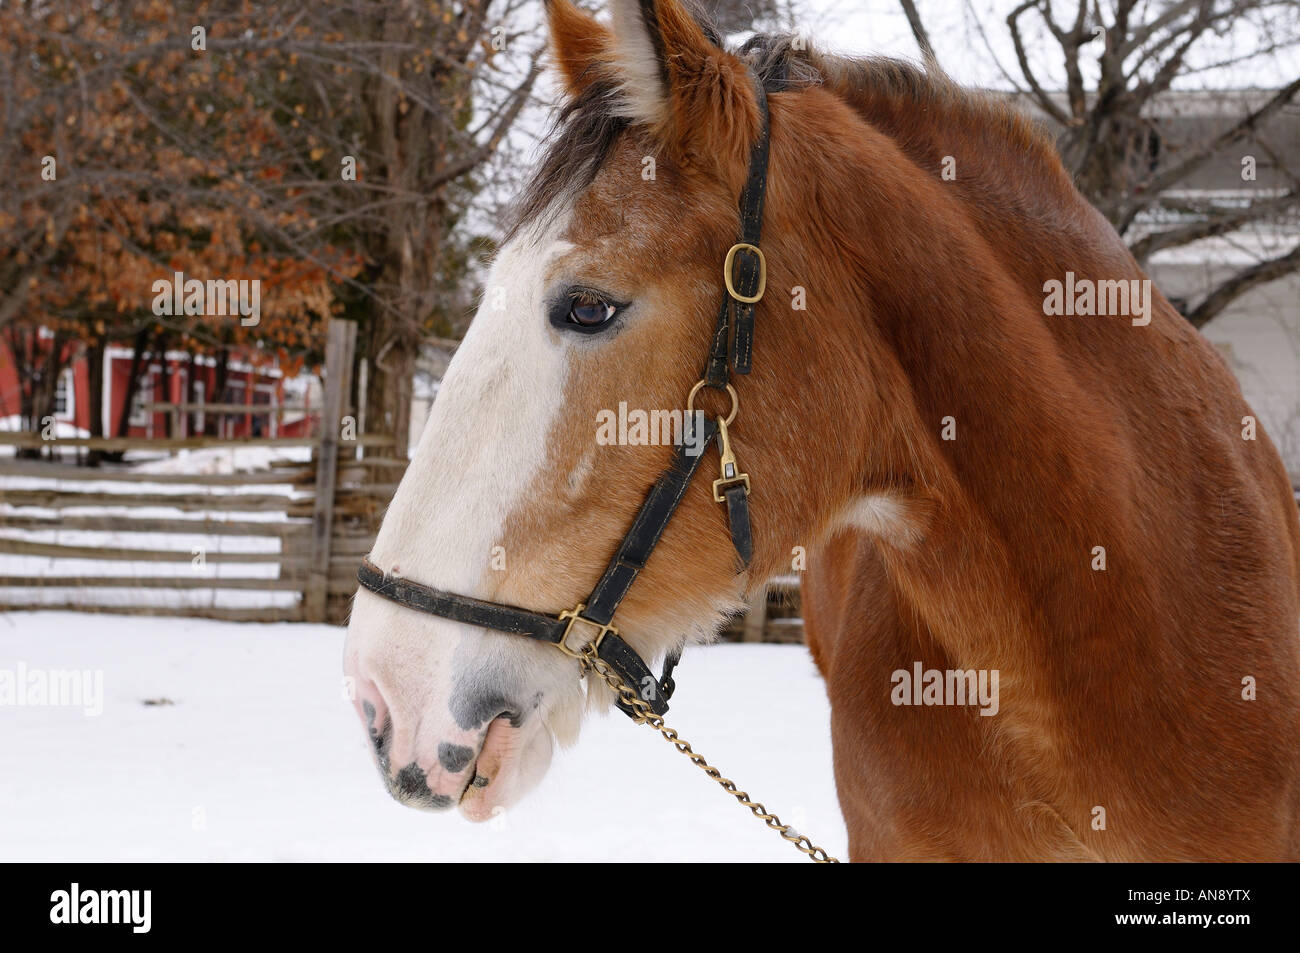 Black horse face close up - photo#52